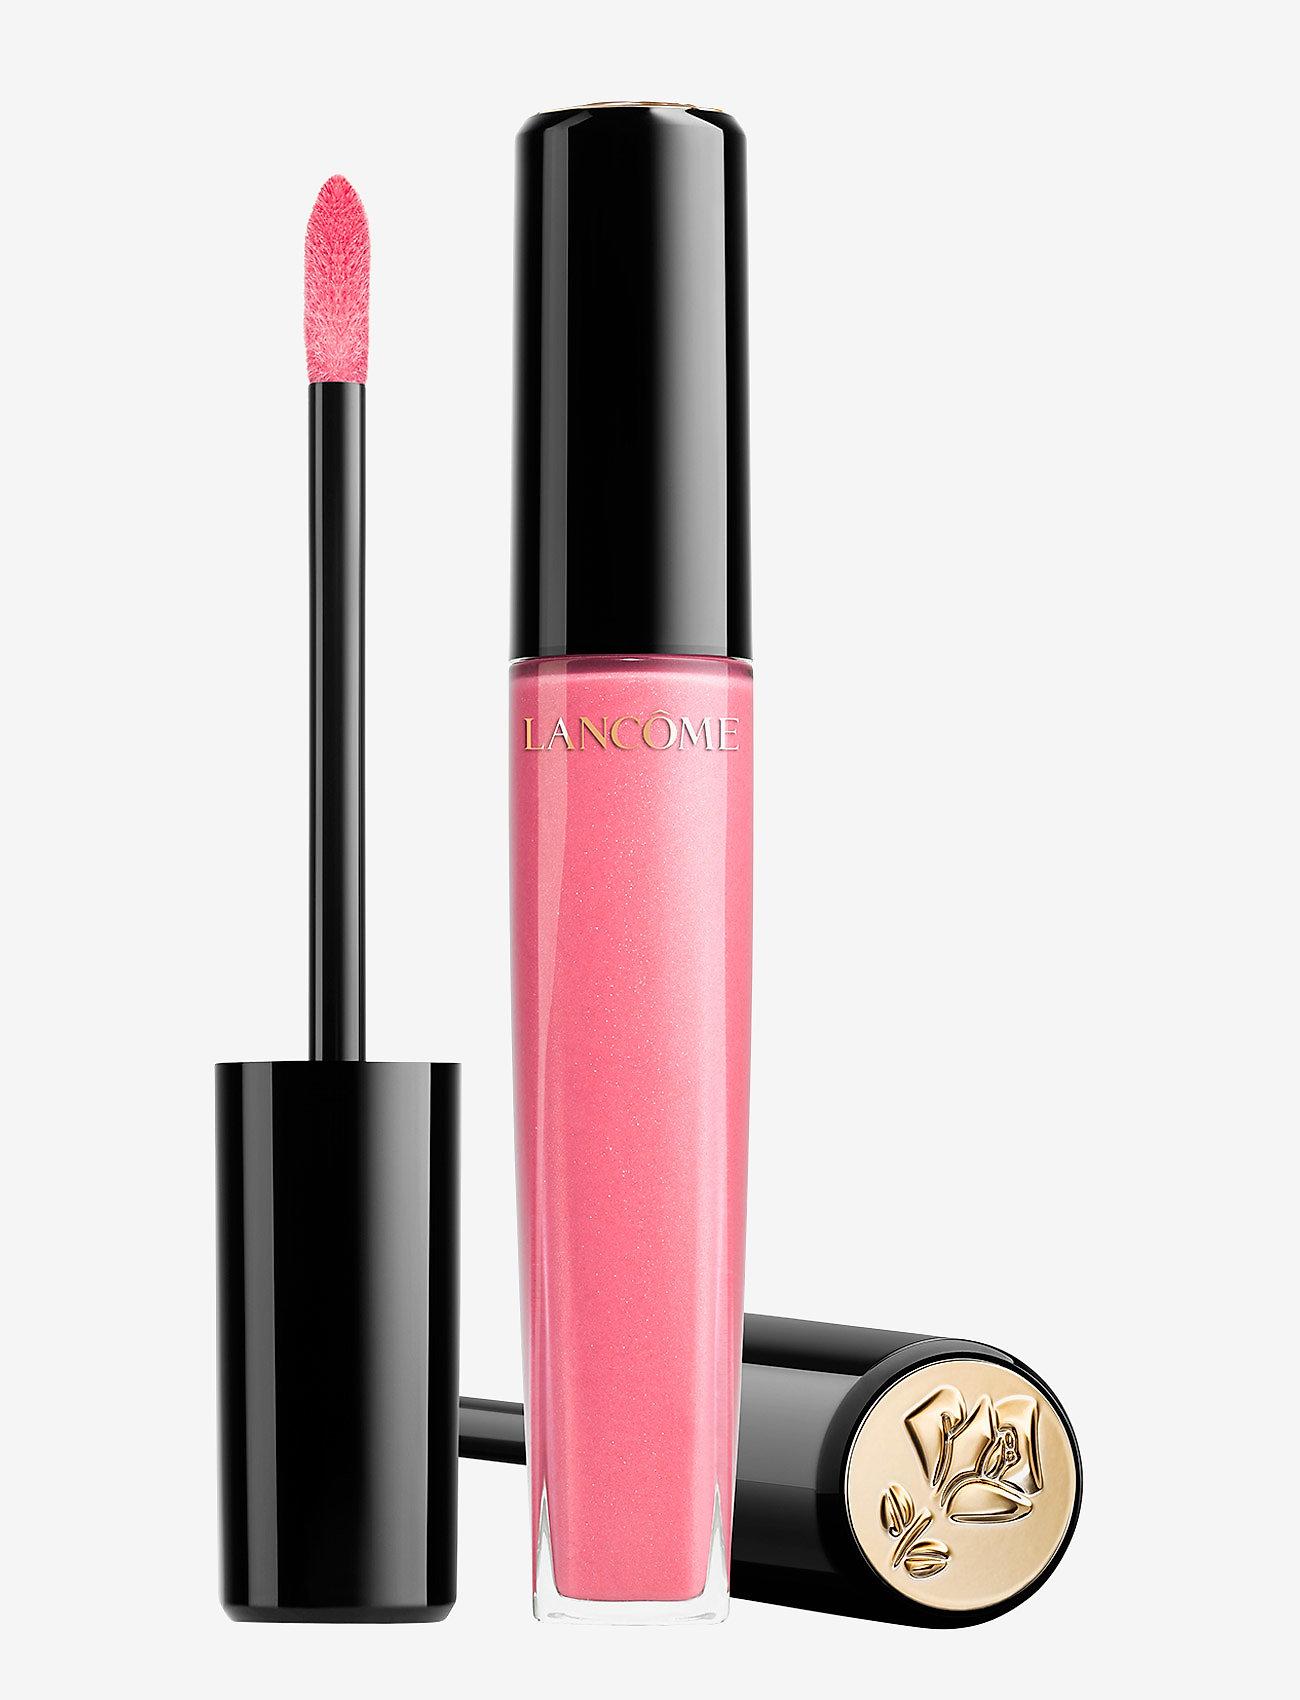 Lancôme - L'Absolu Gloss Cream Lip Gloss - lipgloss - 319 rose caresse - 0